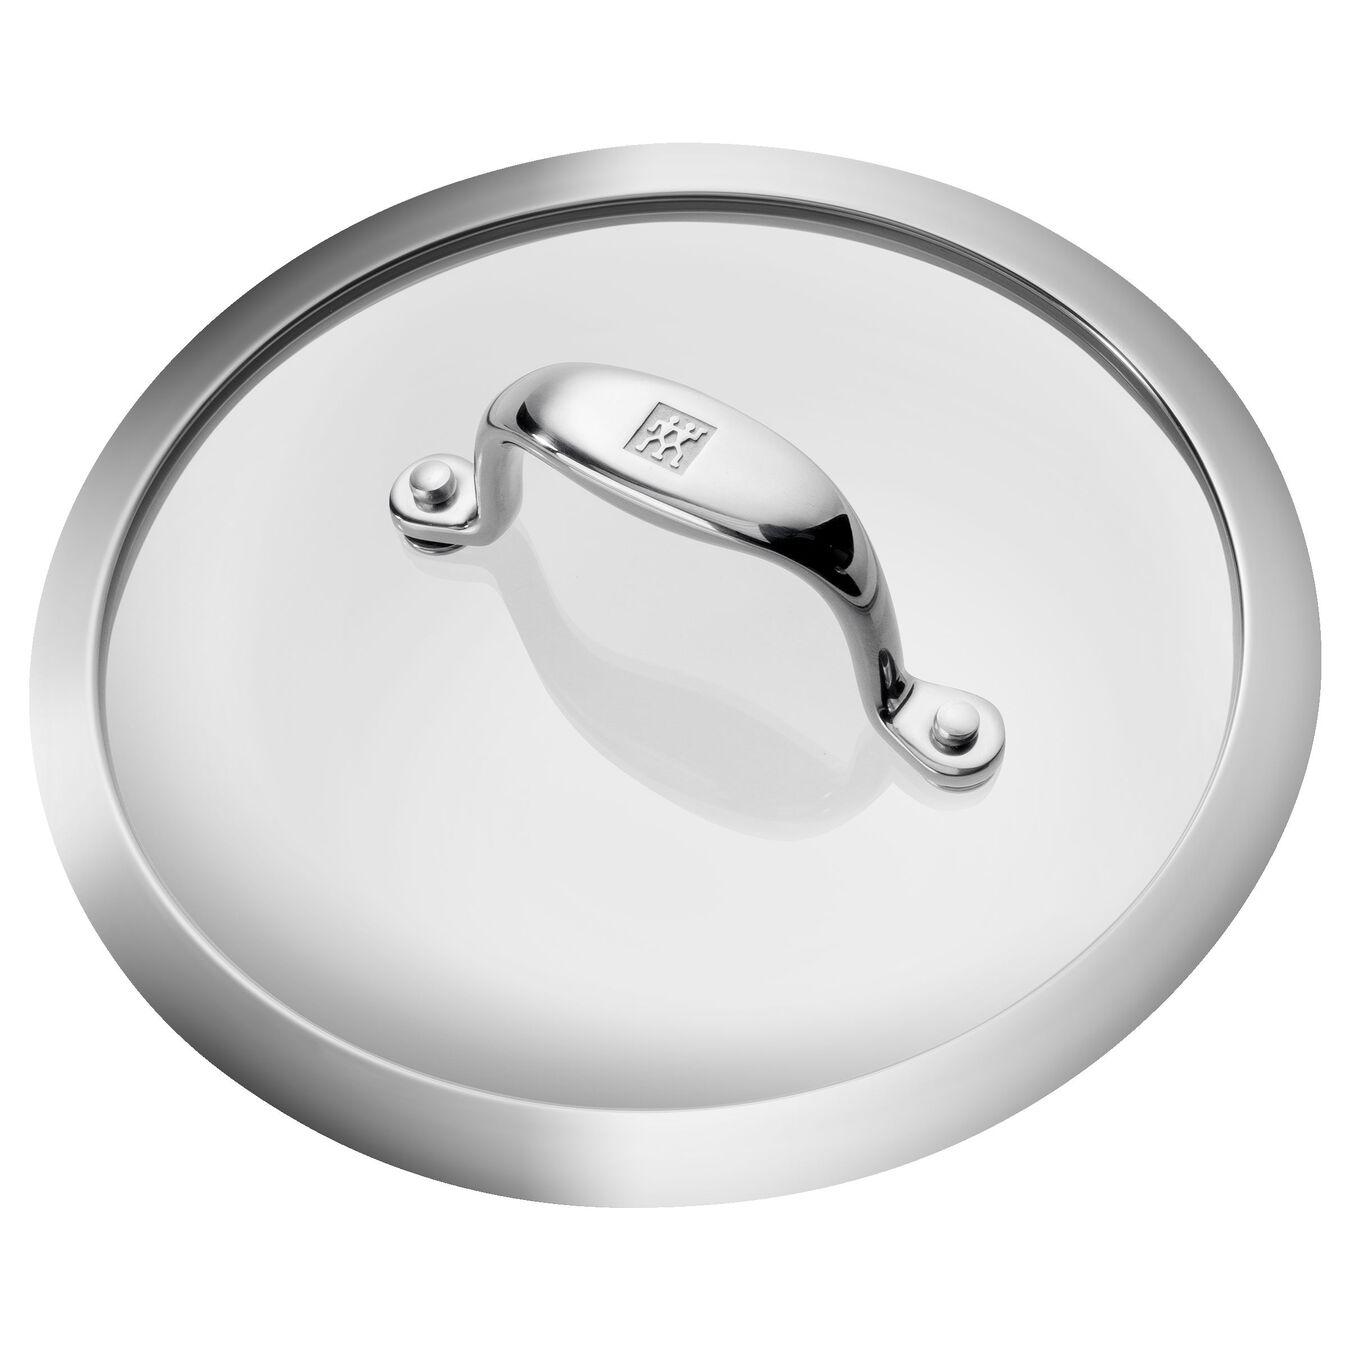 Stieltopf 18 cm, Aluminium, Silber-Schwarz,,large 4